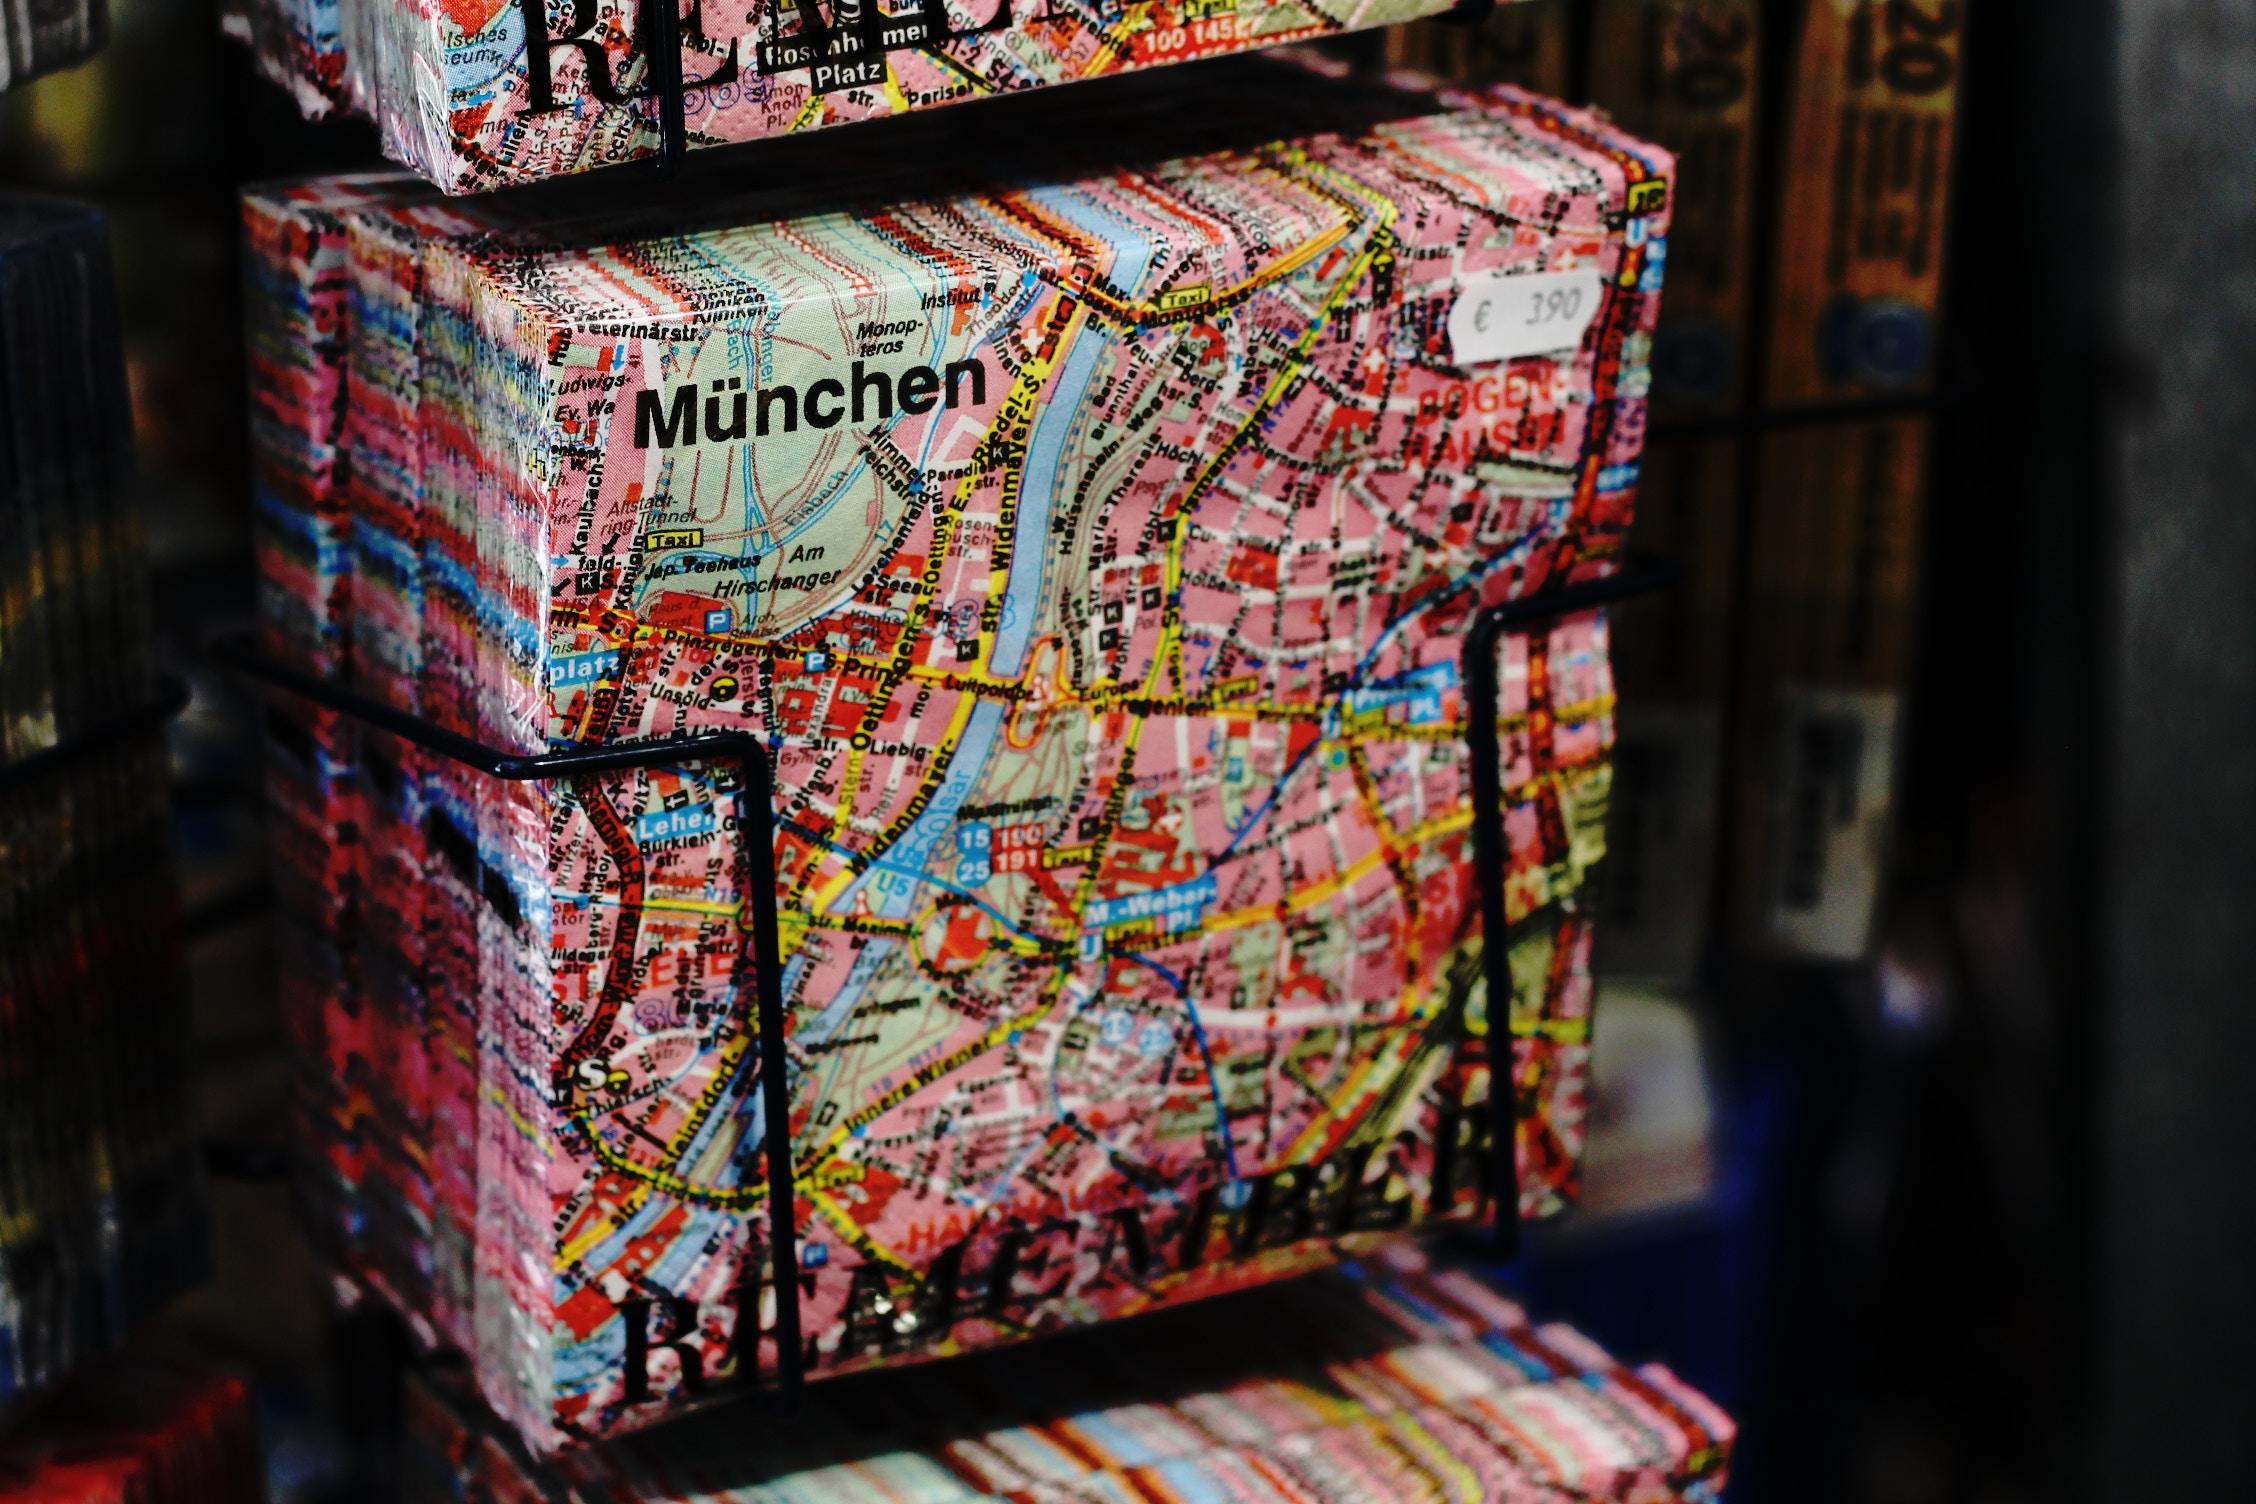 camilla bundgaard 58042 800x533 - 10 Cities, Including Munich to Enjoy a High Quality Life